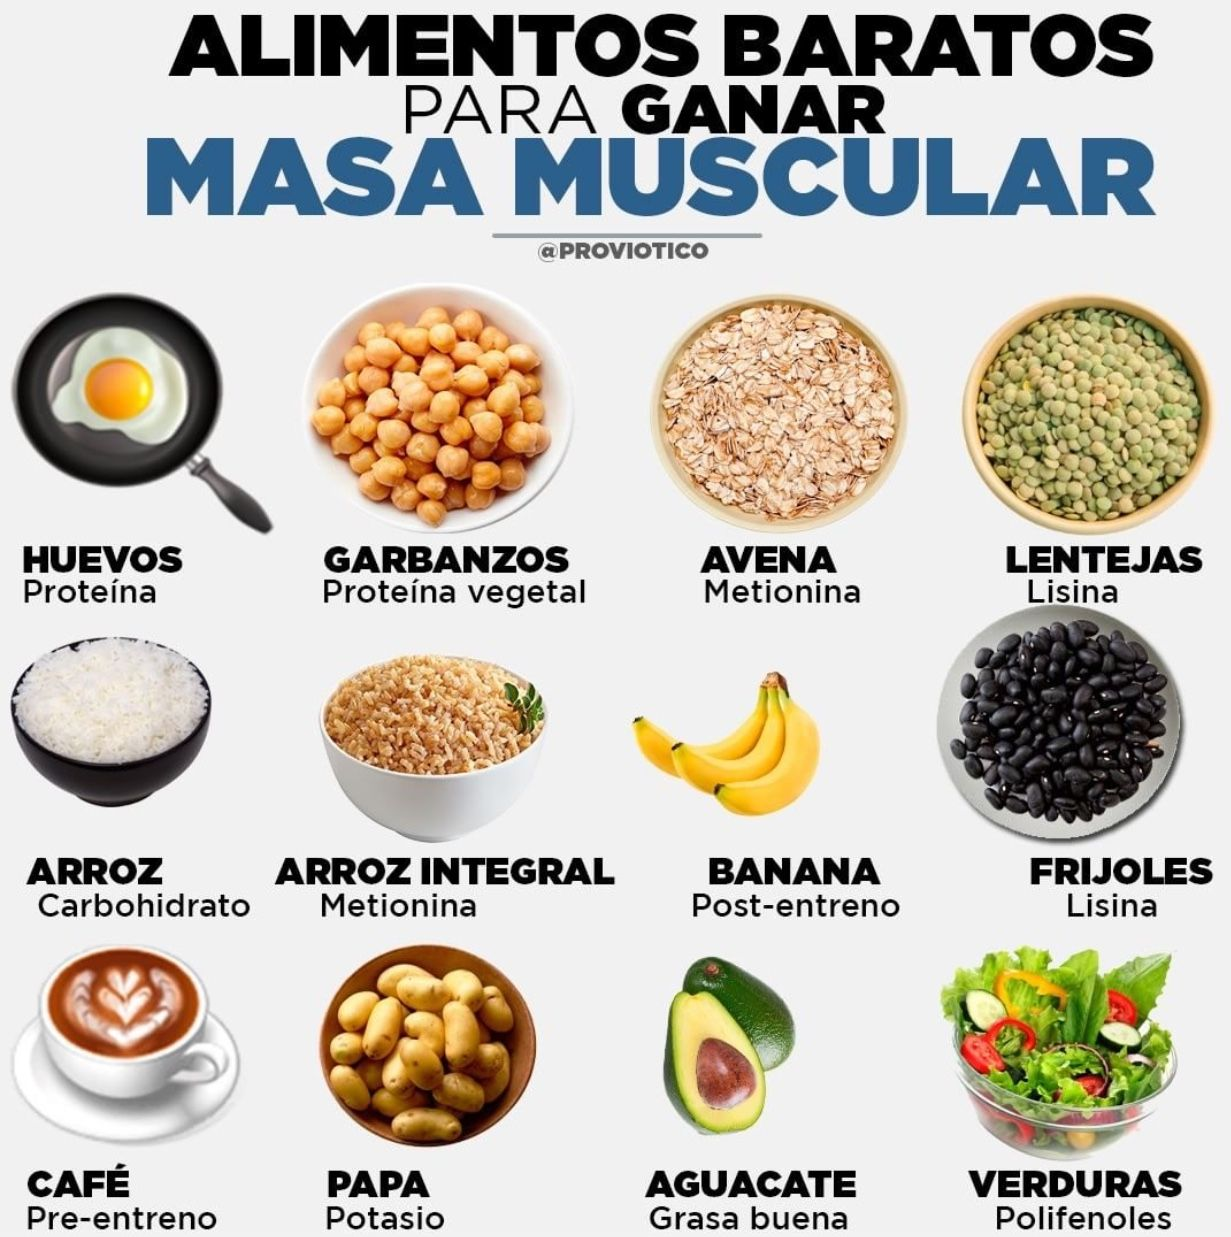 dietas vegetarianas para aumentar masa muscular